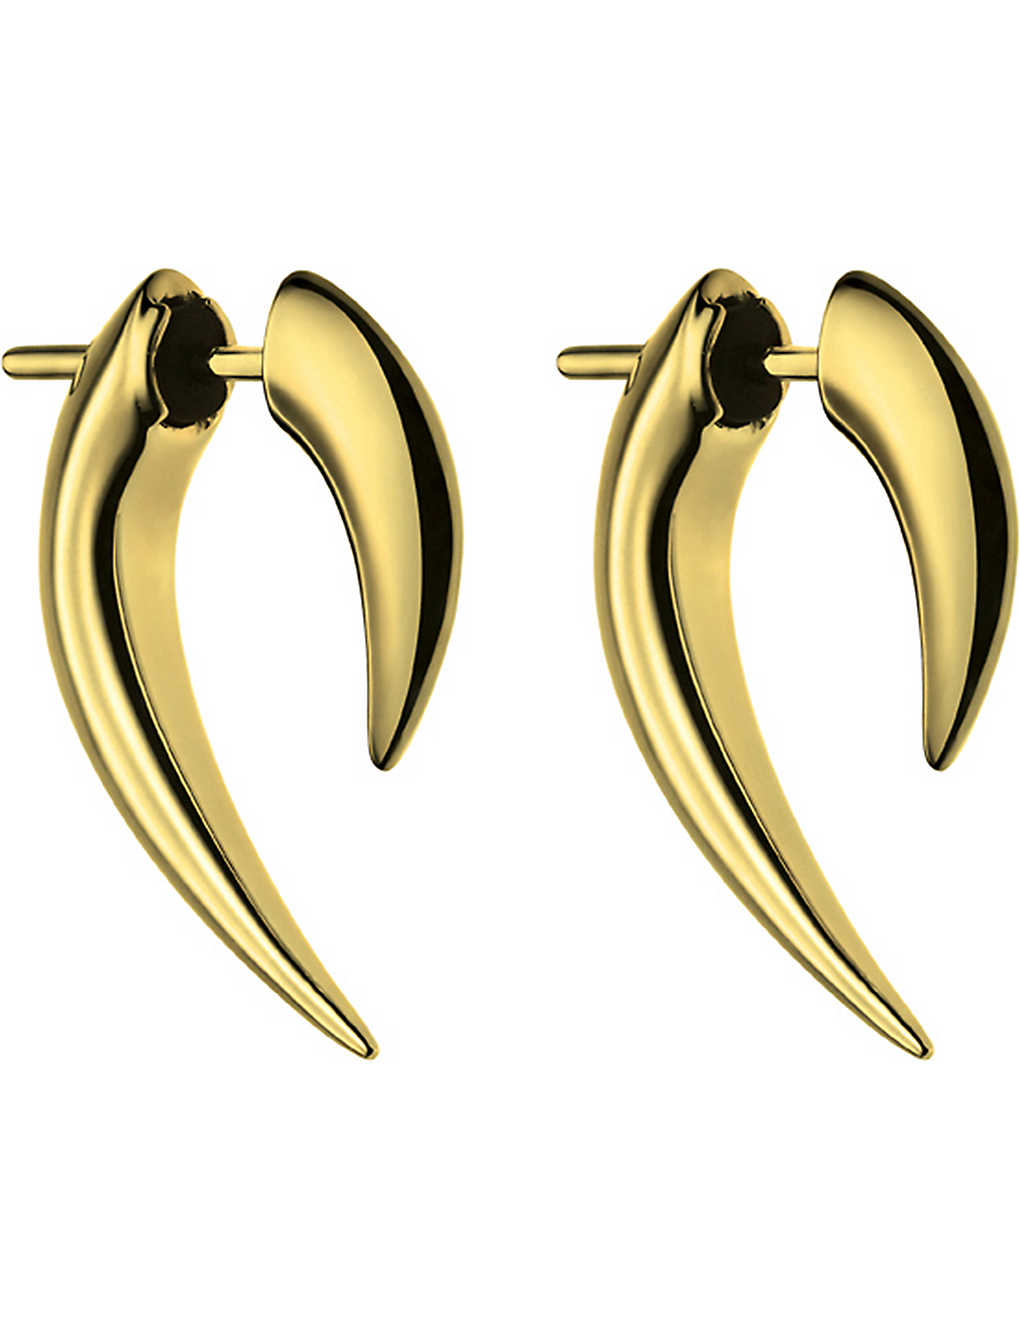 b835dbd4f SHAUN LEANE - Sterling silver and gold vermeil talon earrings ...